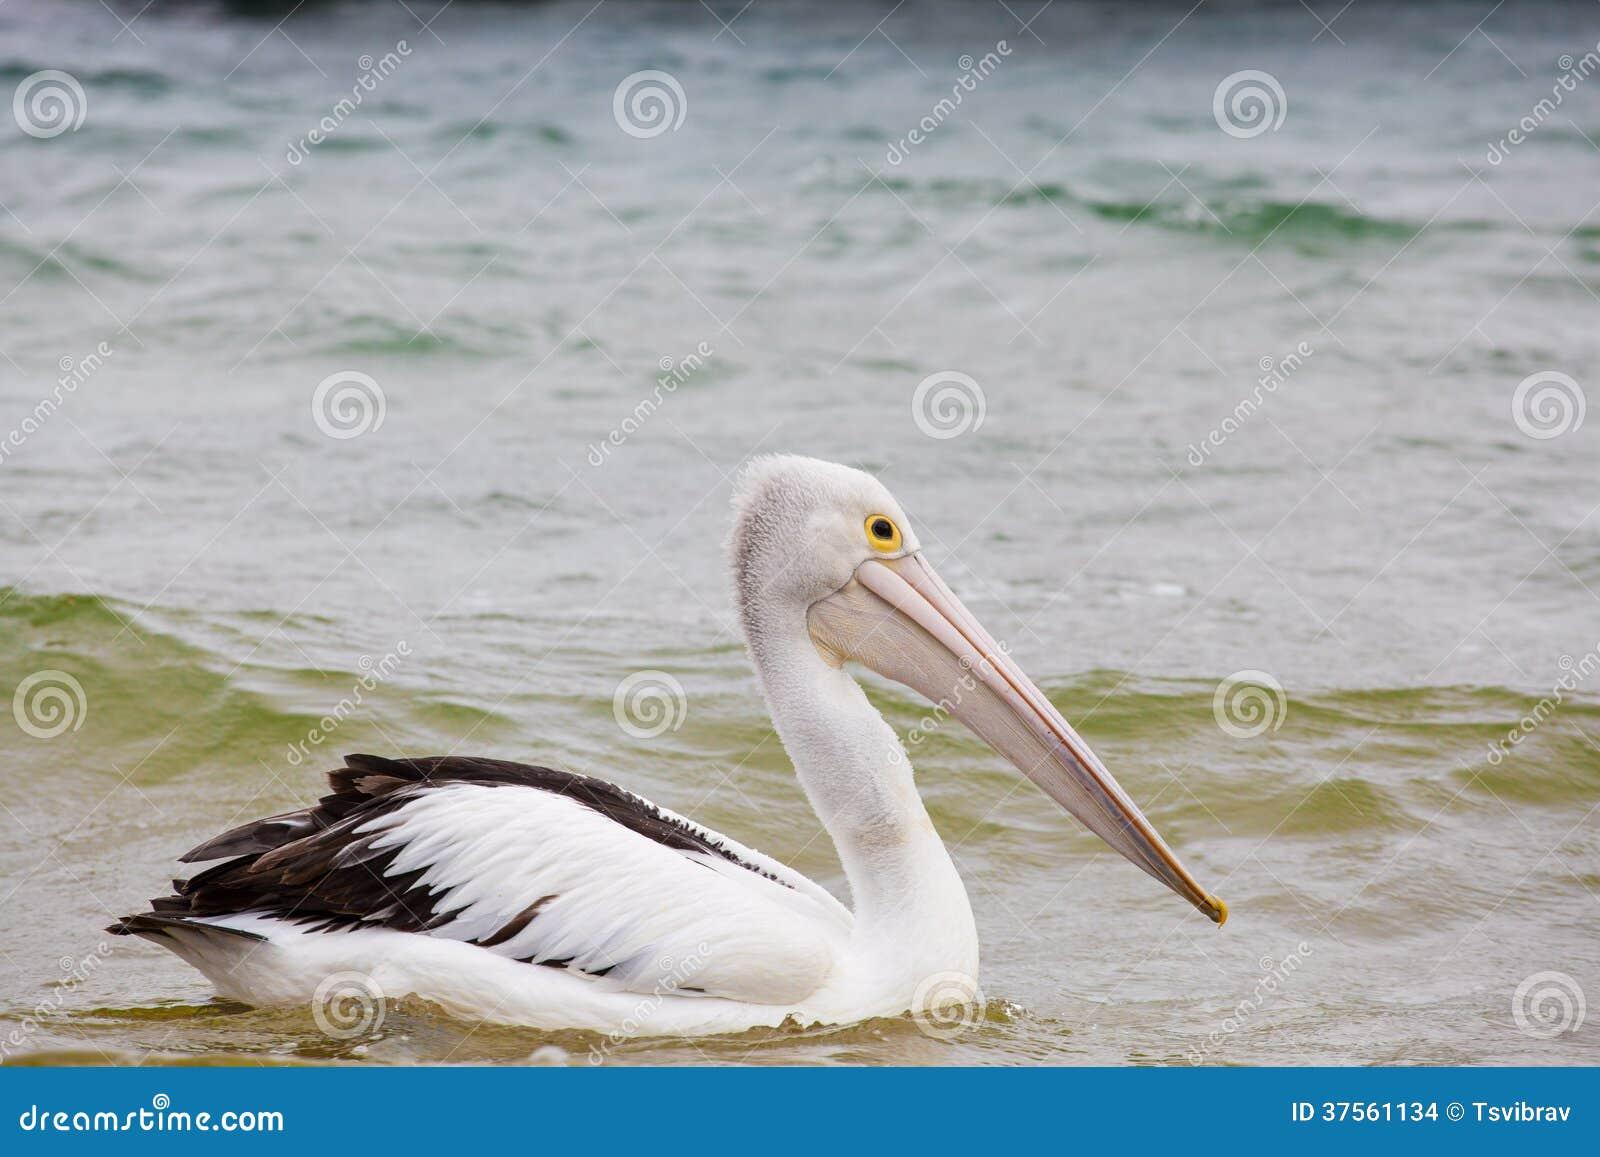 Australian Pelican Drifting On Ocean Waves Stock Photo ...